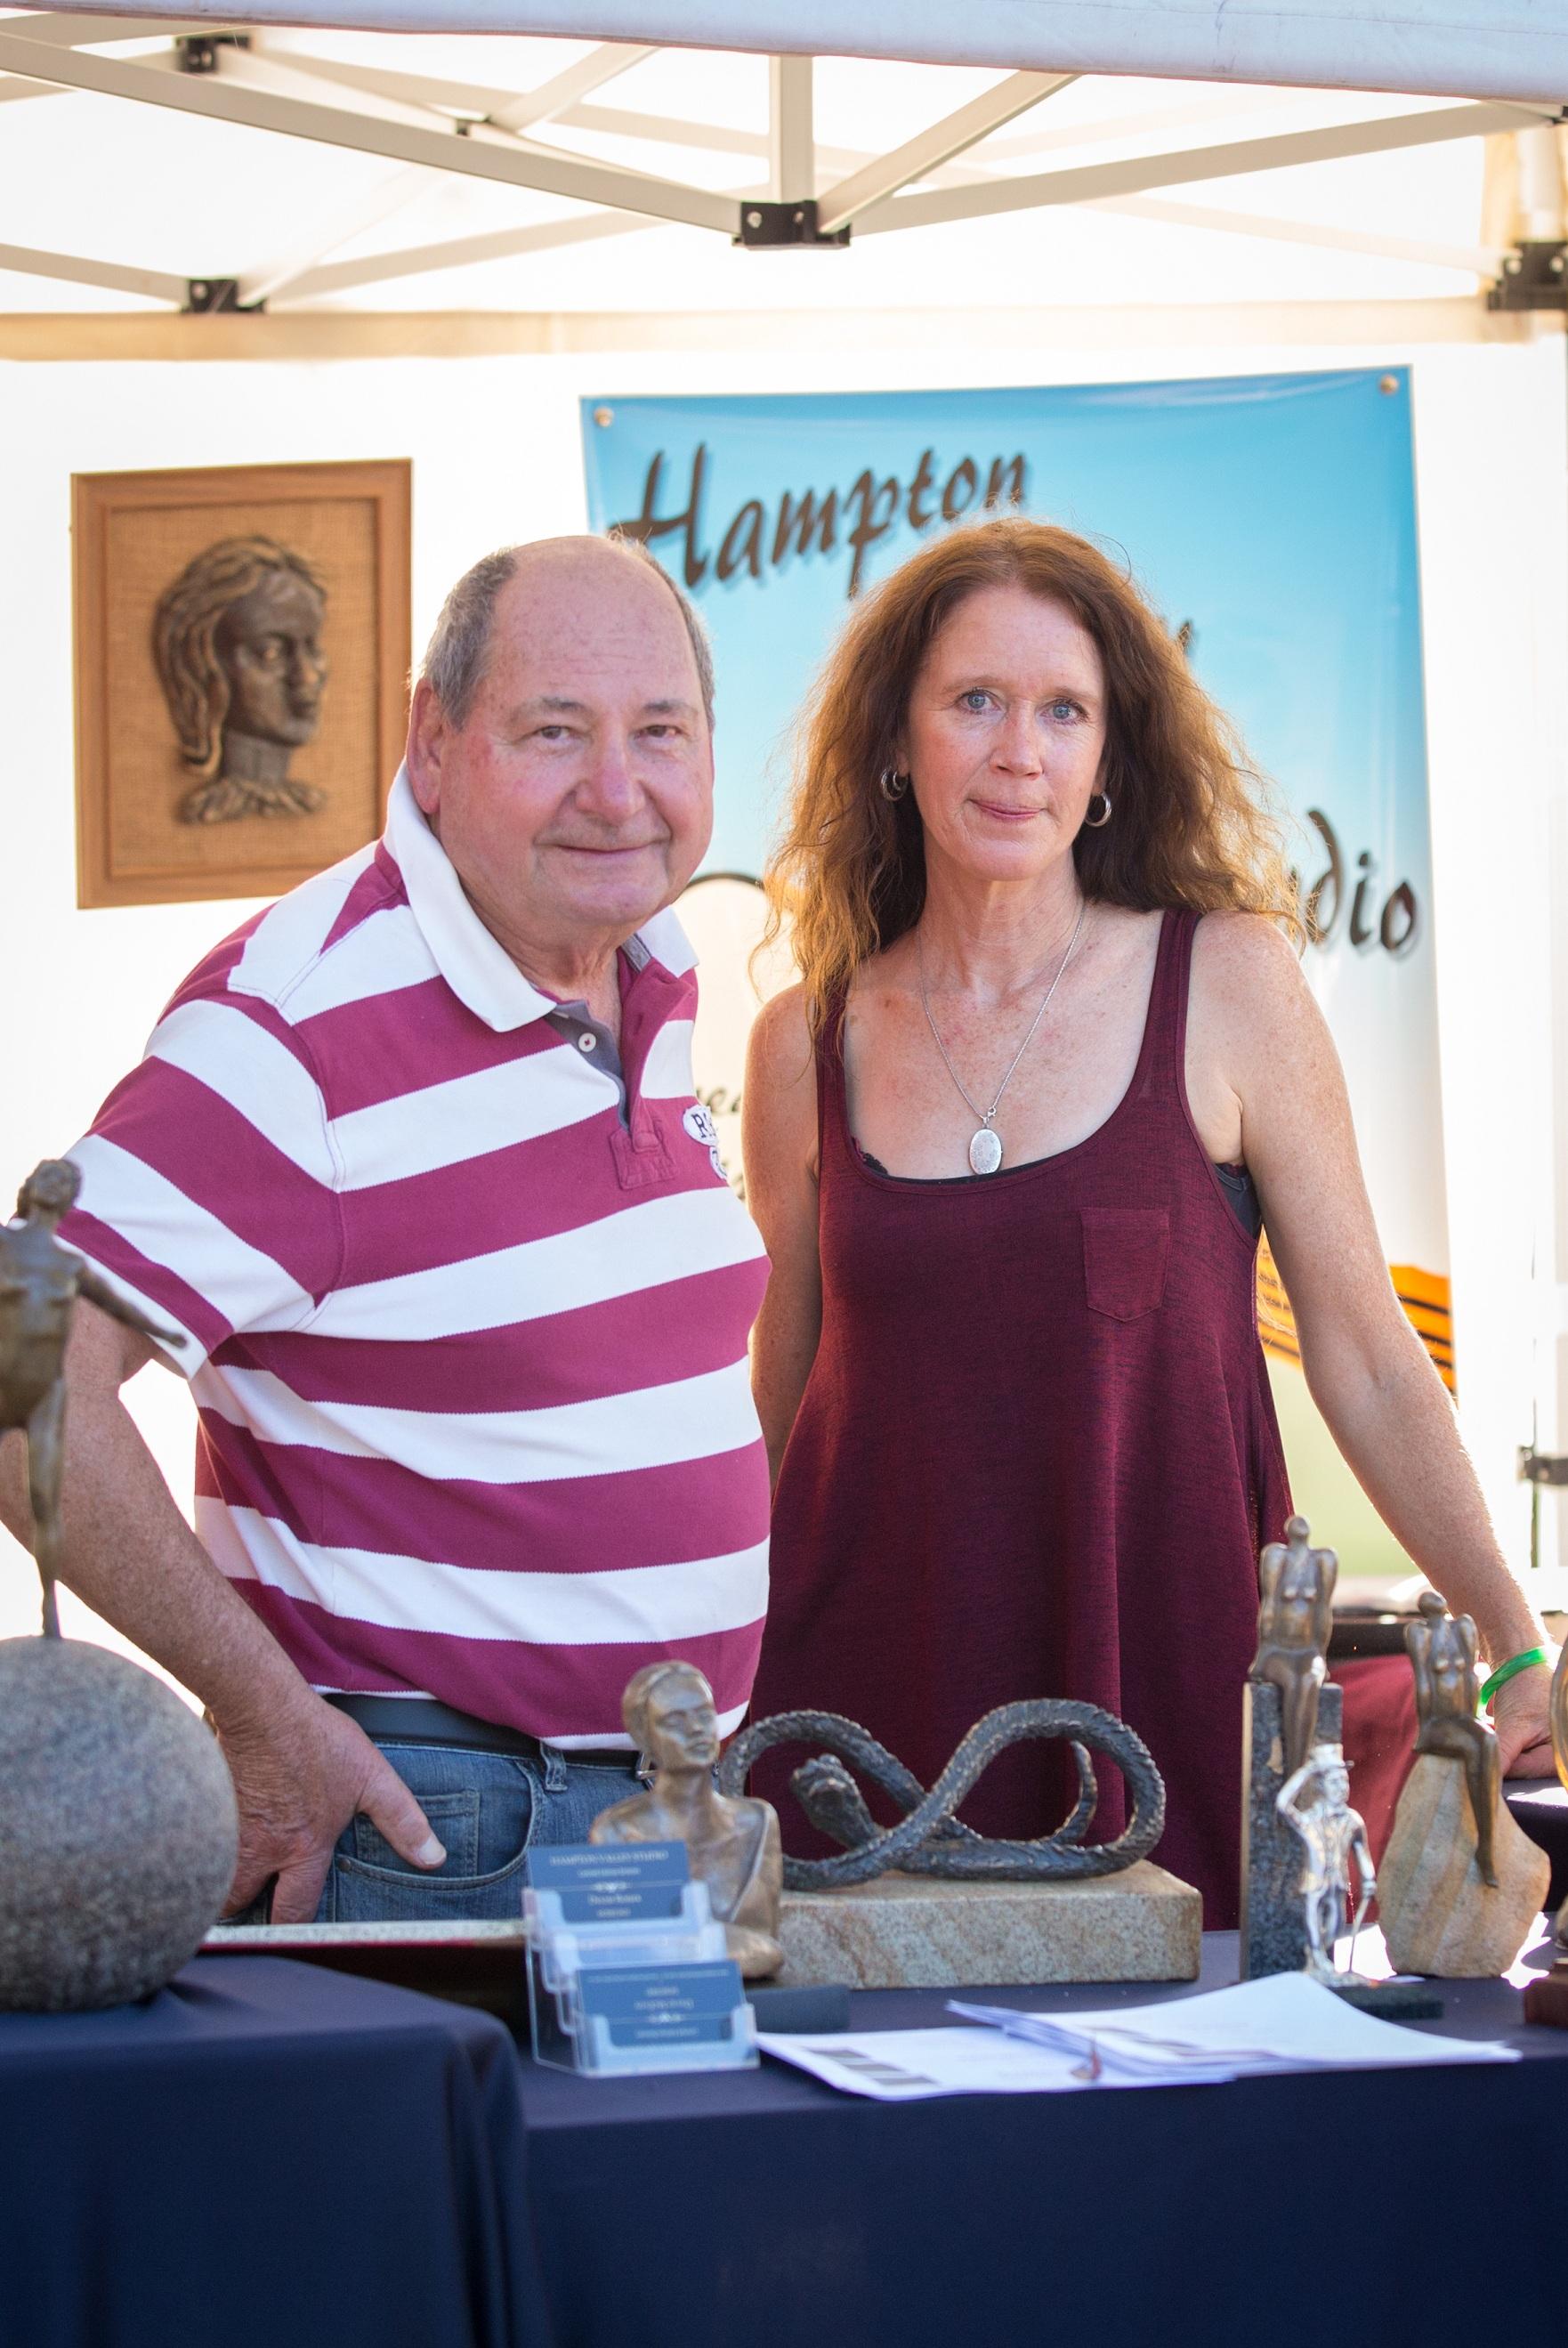 Hampton Valley Studio owner David McEvoy with sculptor Denise Rosser.